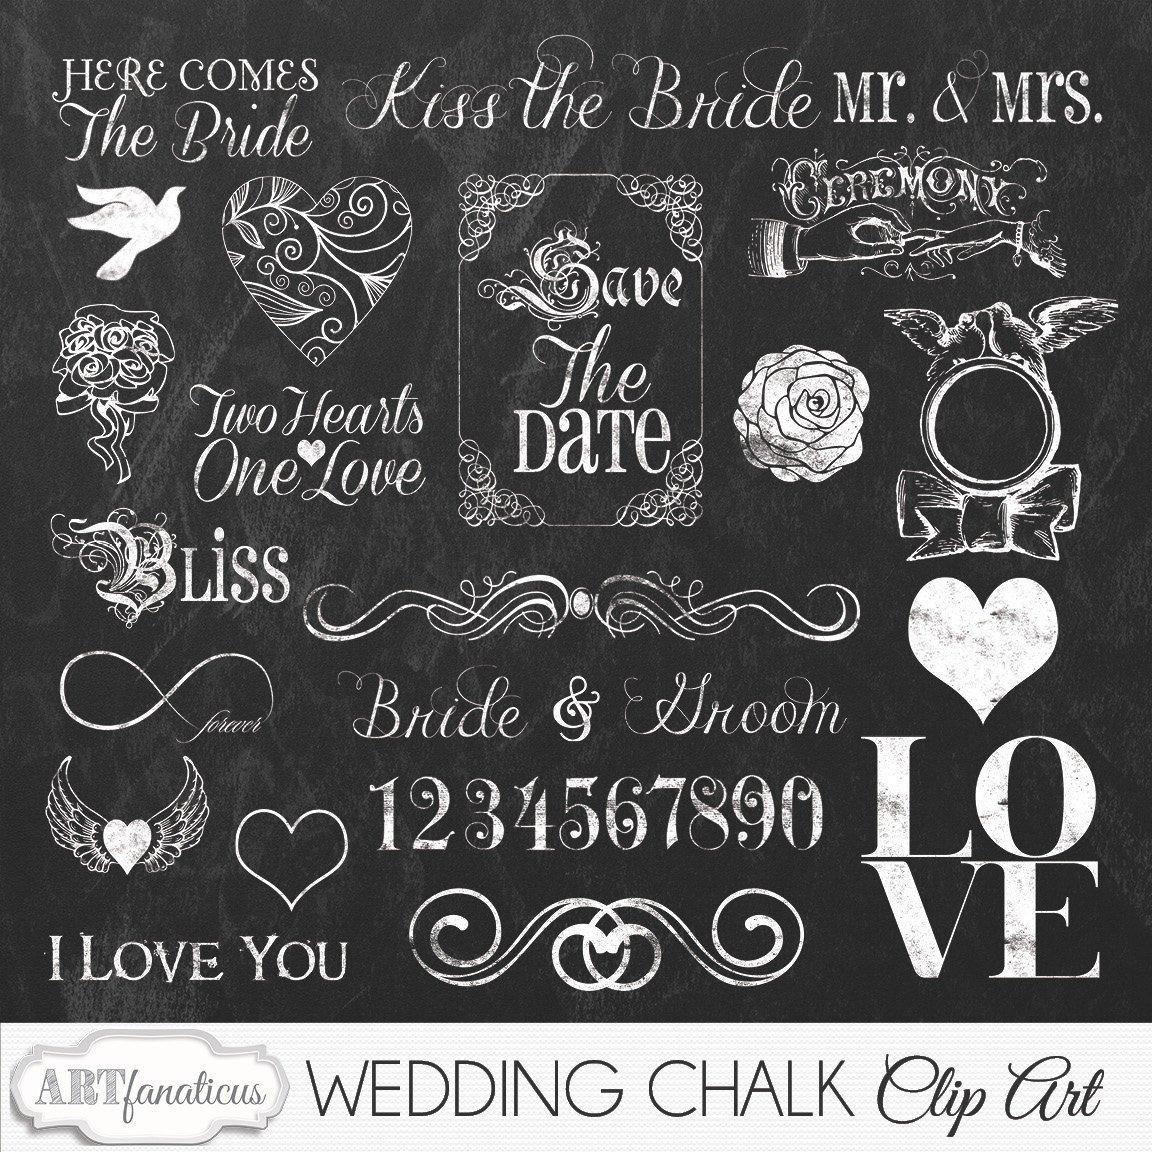 Chalkboard clipart scrapbook. Artfanaticus wedding cliparts chalk